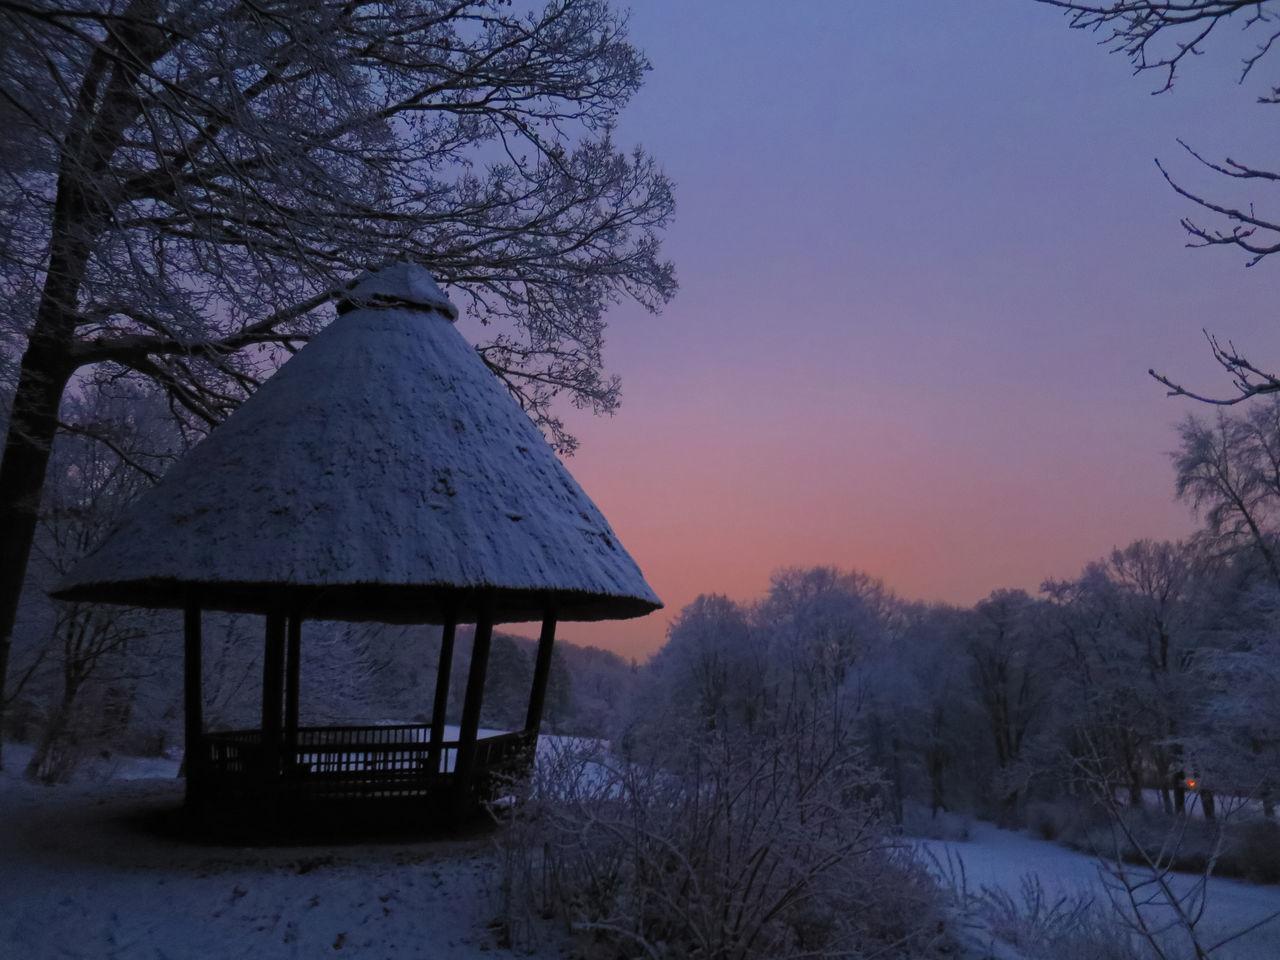 Deepfreeze BadPyrmont Schnee Winter Germany Snow January2015 Twilight Pastel Power Pastel Colors Sunset After Sunset Snow Day